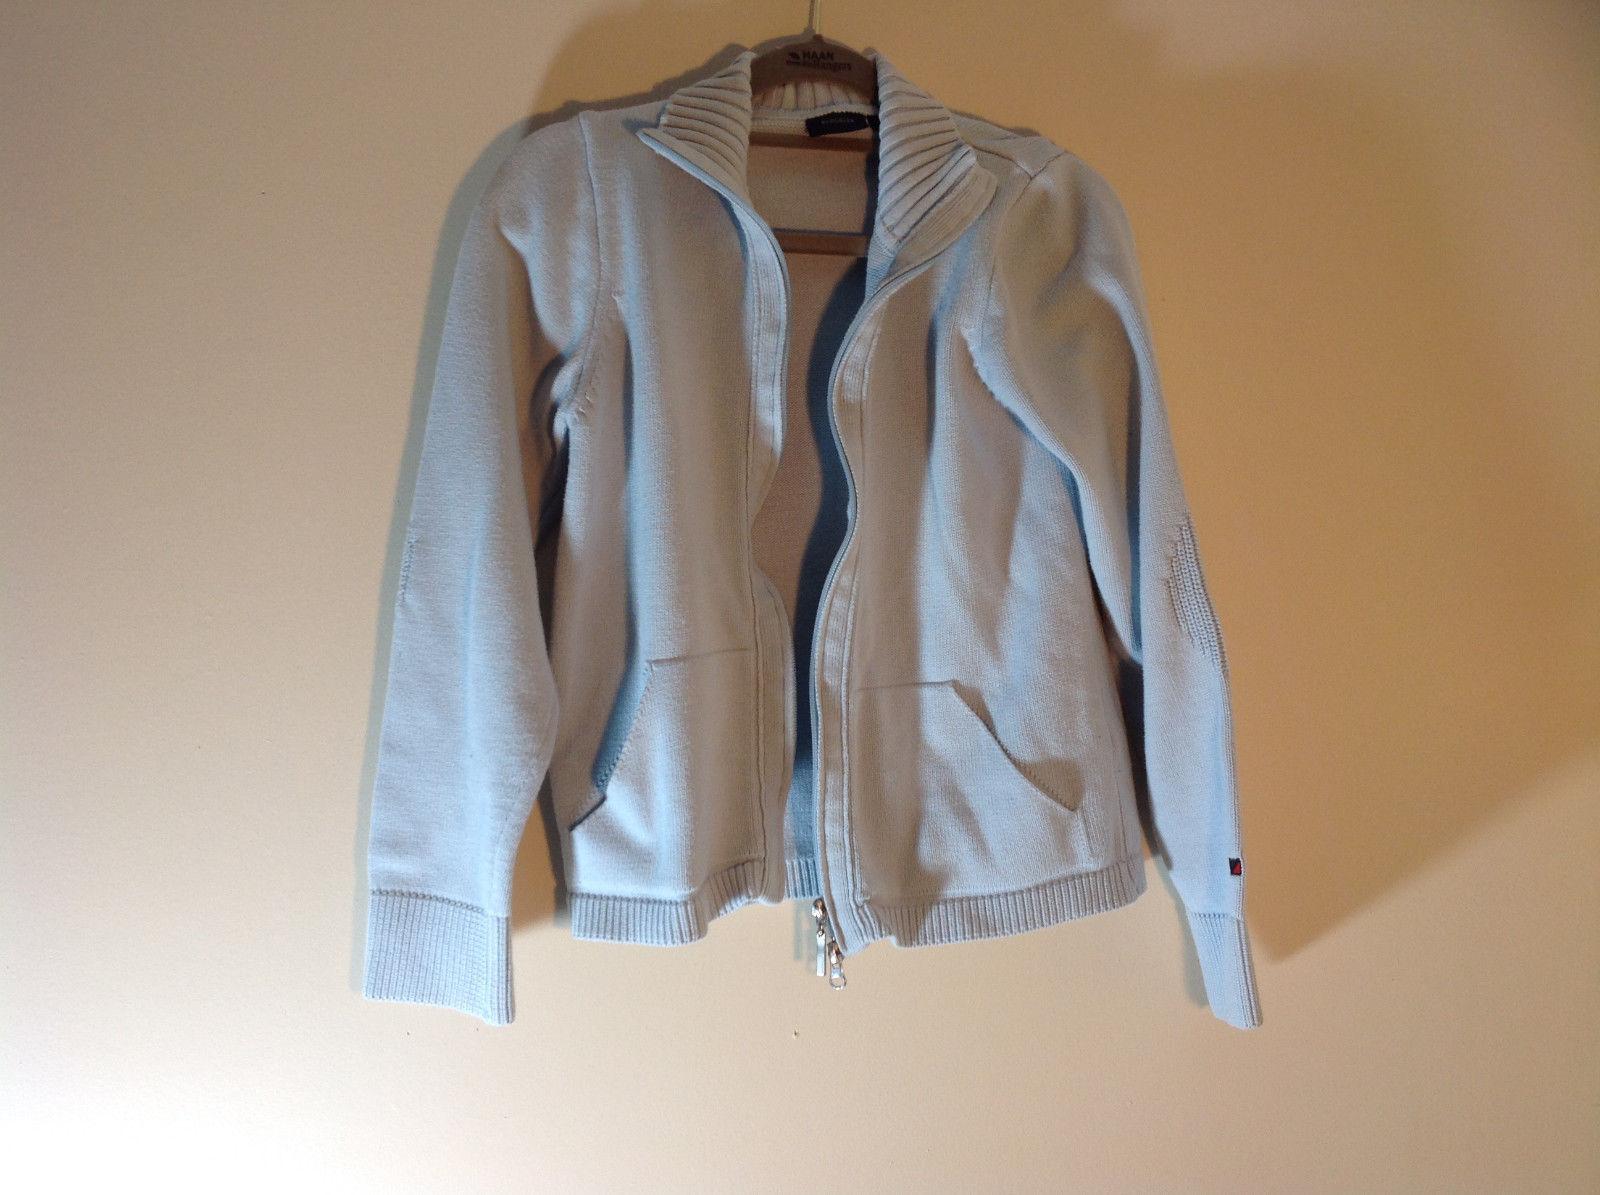 Light Blue Double Zipper Sweater 2 Pockets 100% Cotton Size Medium